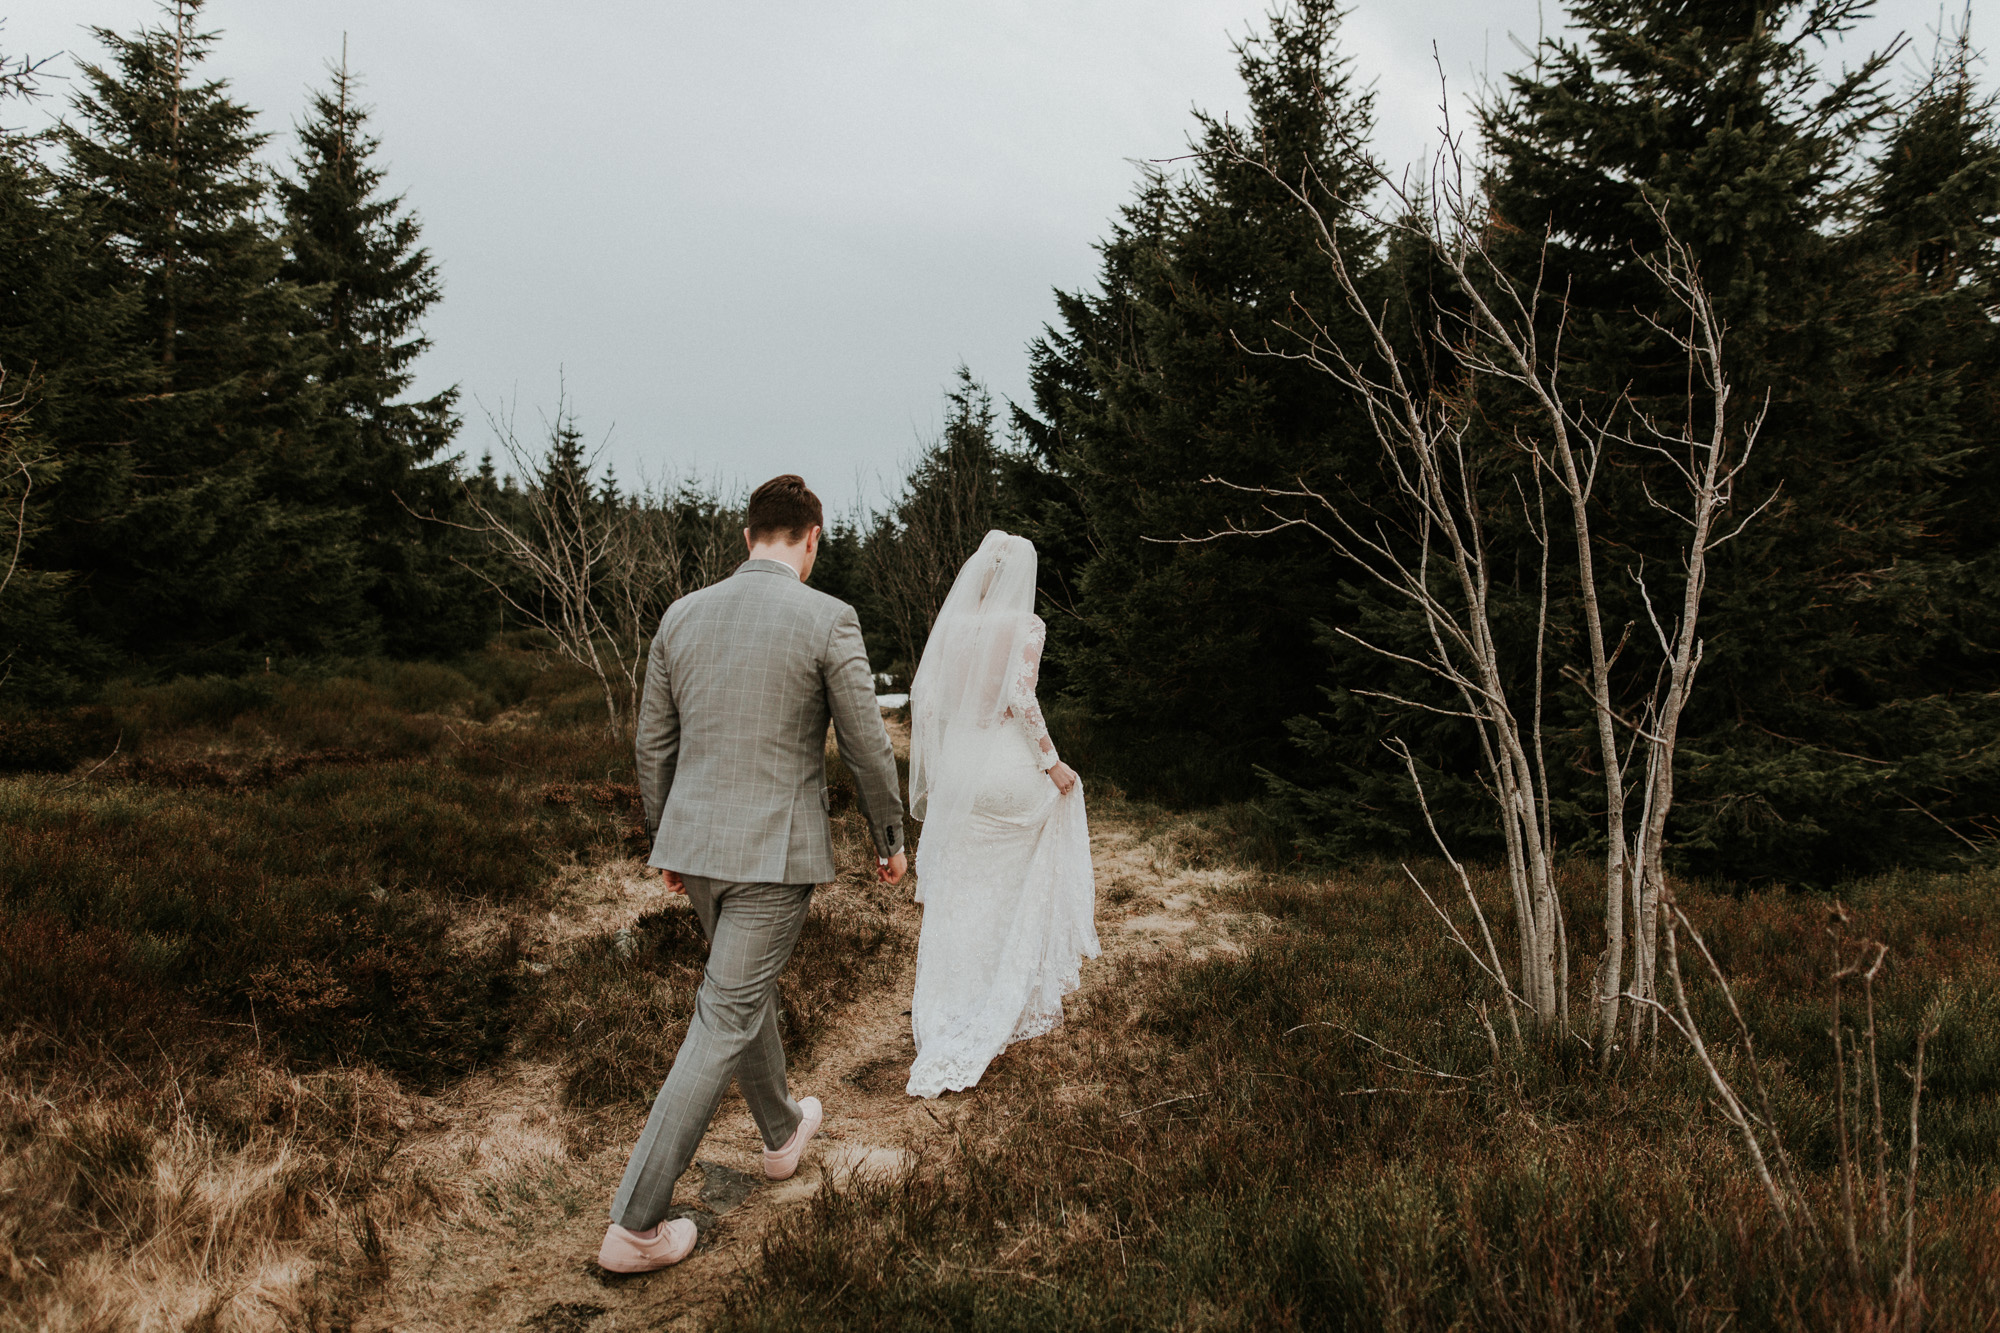 DanielaMarquardtPhotography_Hochzeitsfotograf_Düsseldorf_Köln_Mallorca_Bayern_Austria_Harz_LinaundMaik_Afterwedding-Shooting_Weddingphotographer_Ibiza_Tuskany_Italien_Toskana70